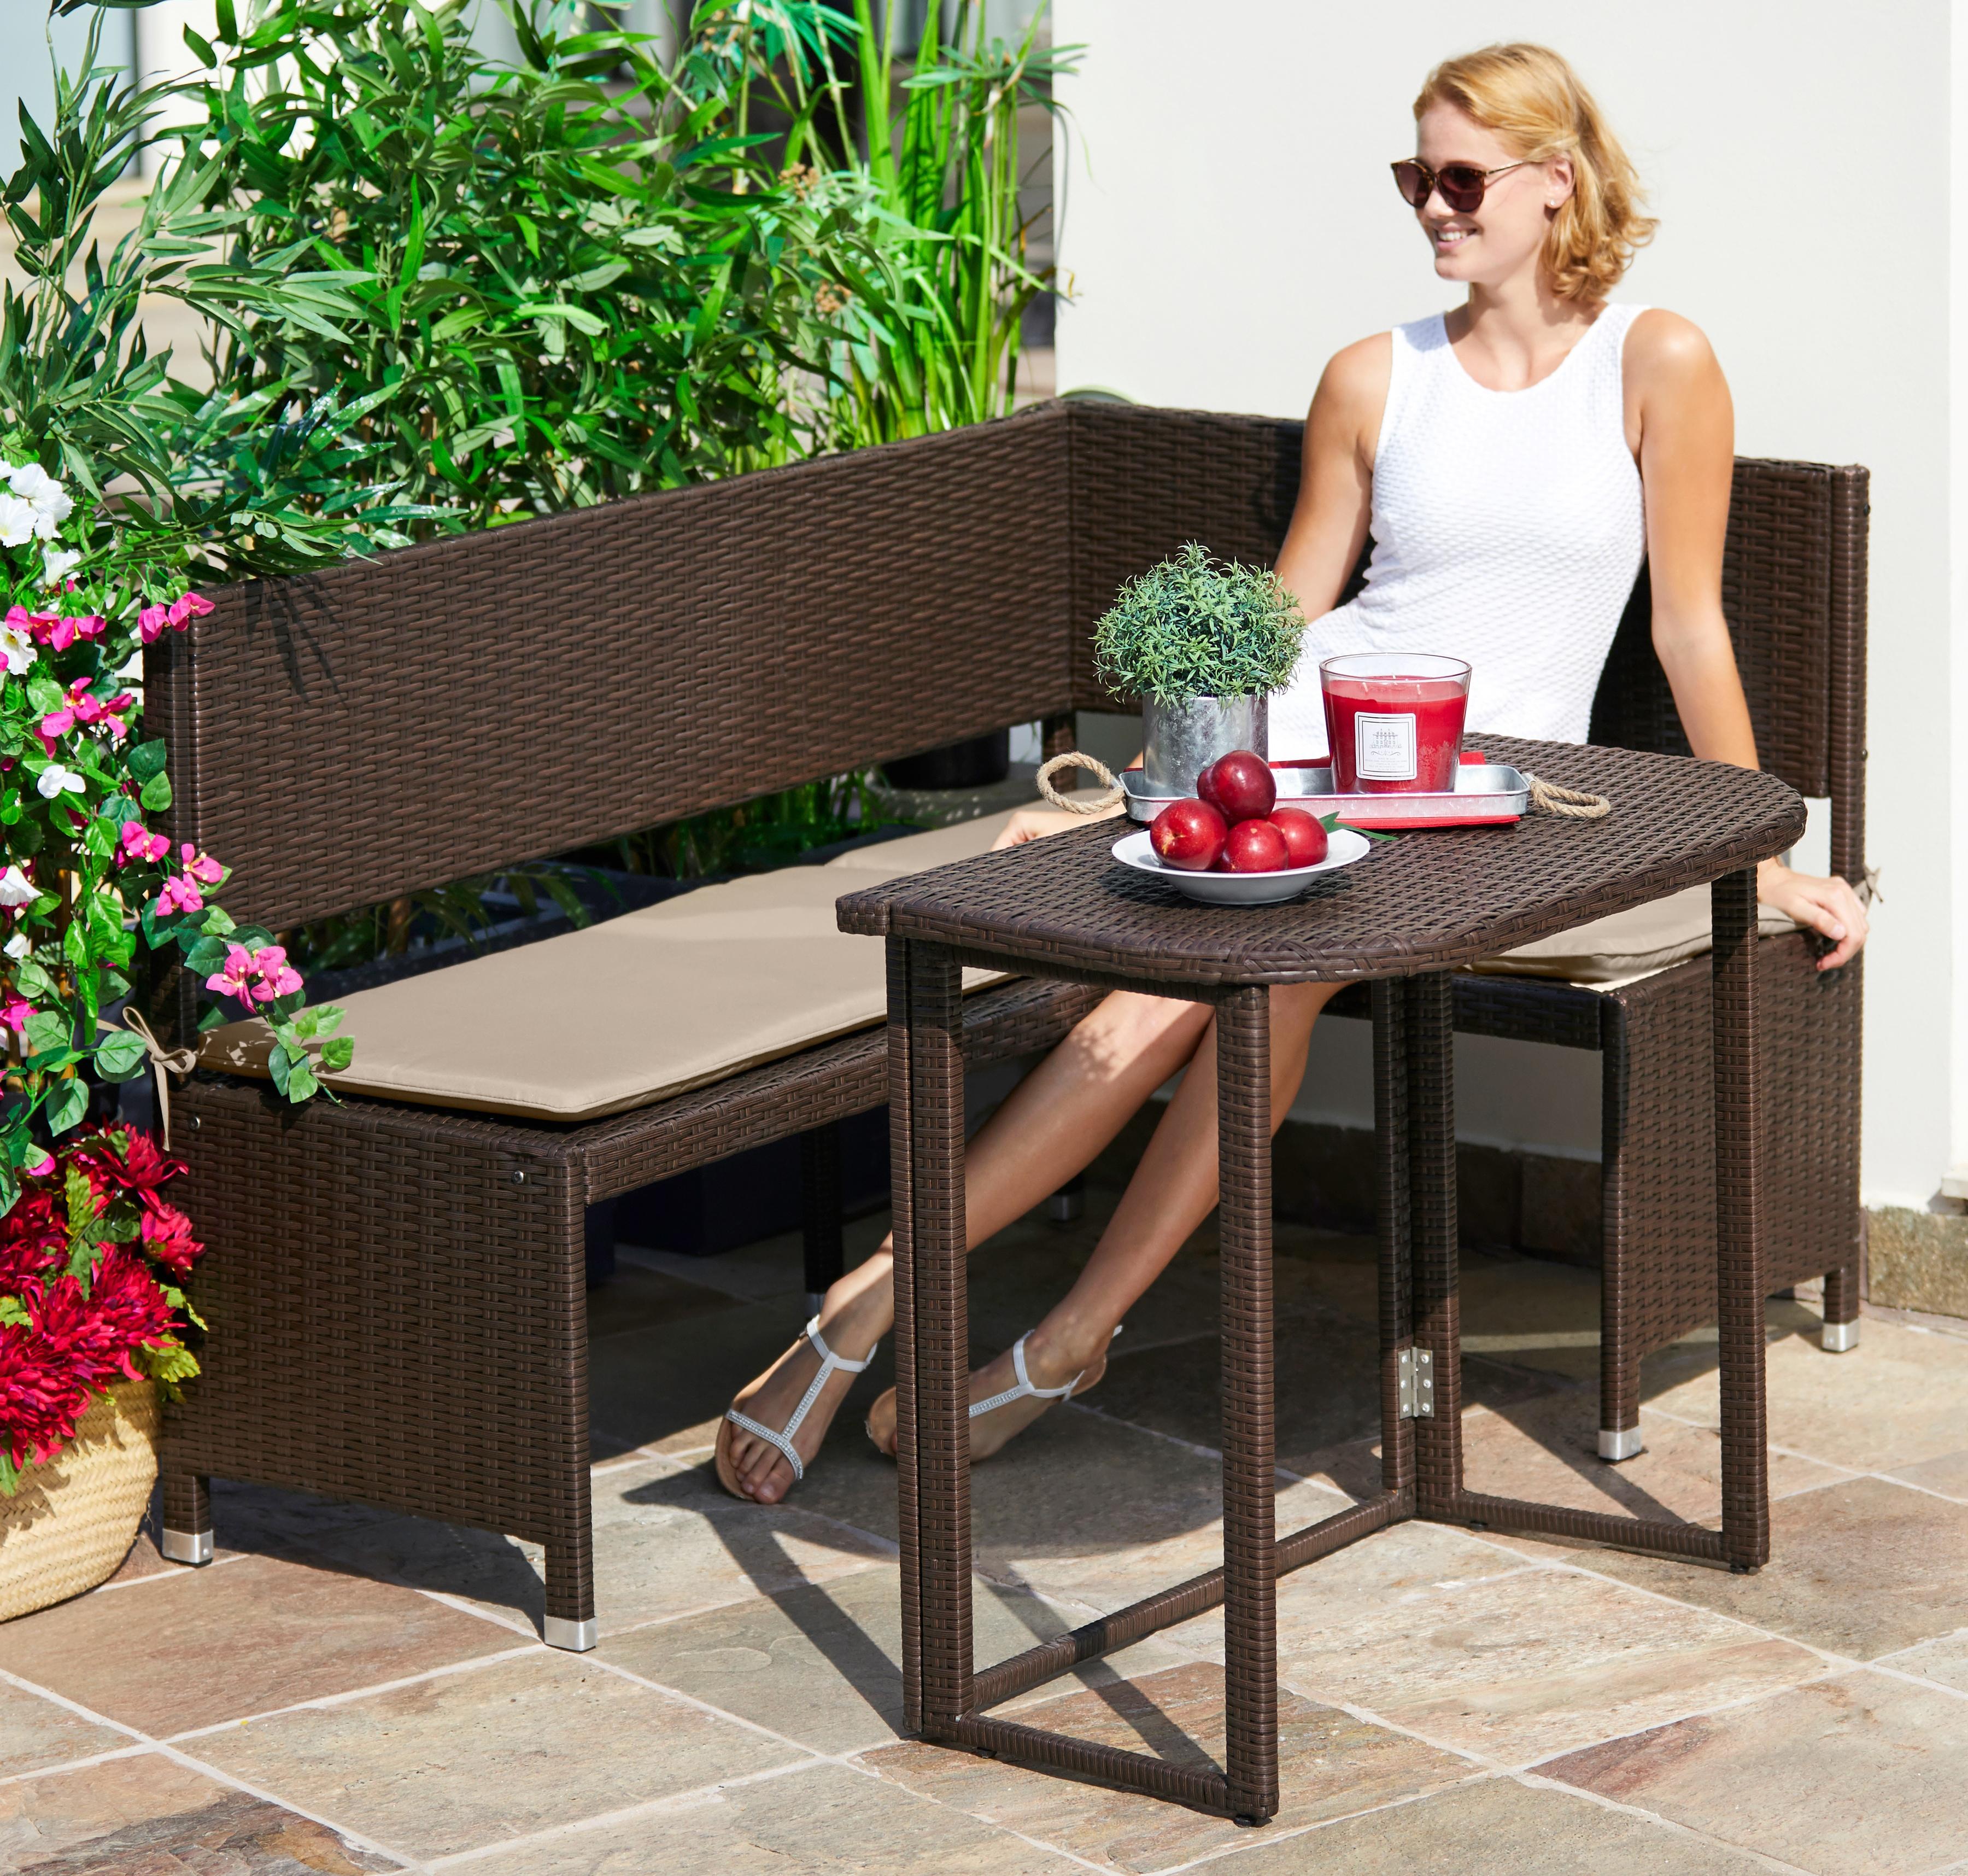 MERXX Gartenmöbelset Rattan 4-tlg Eckbank Tisch90x50 cm Polyrattan